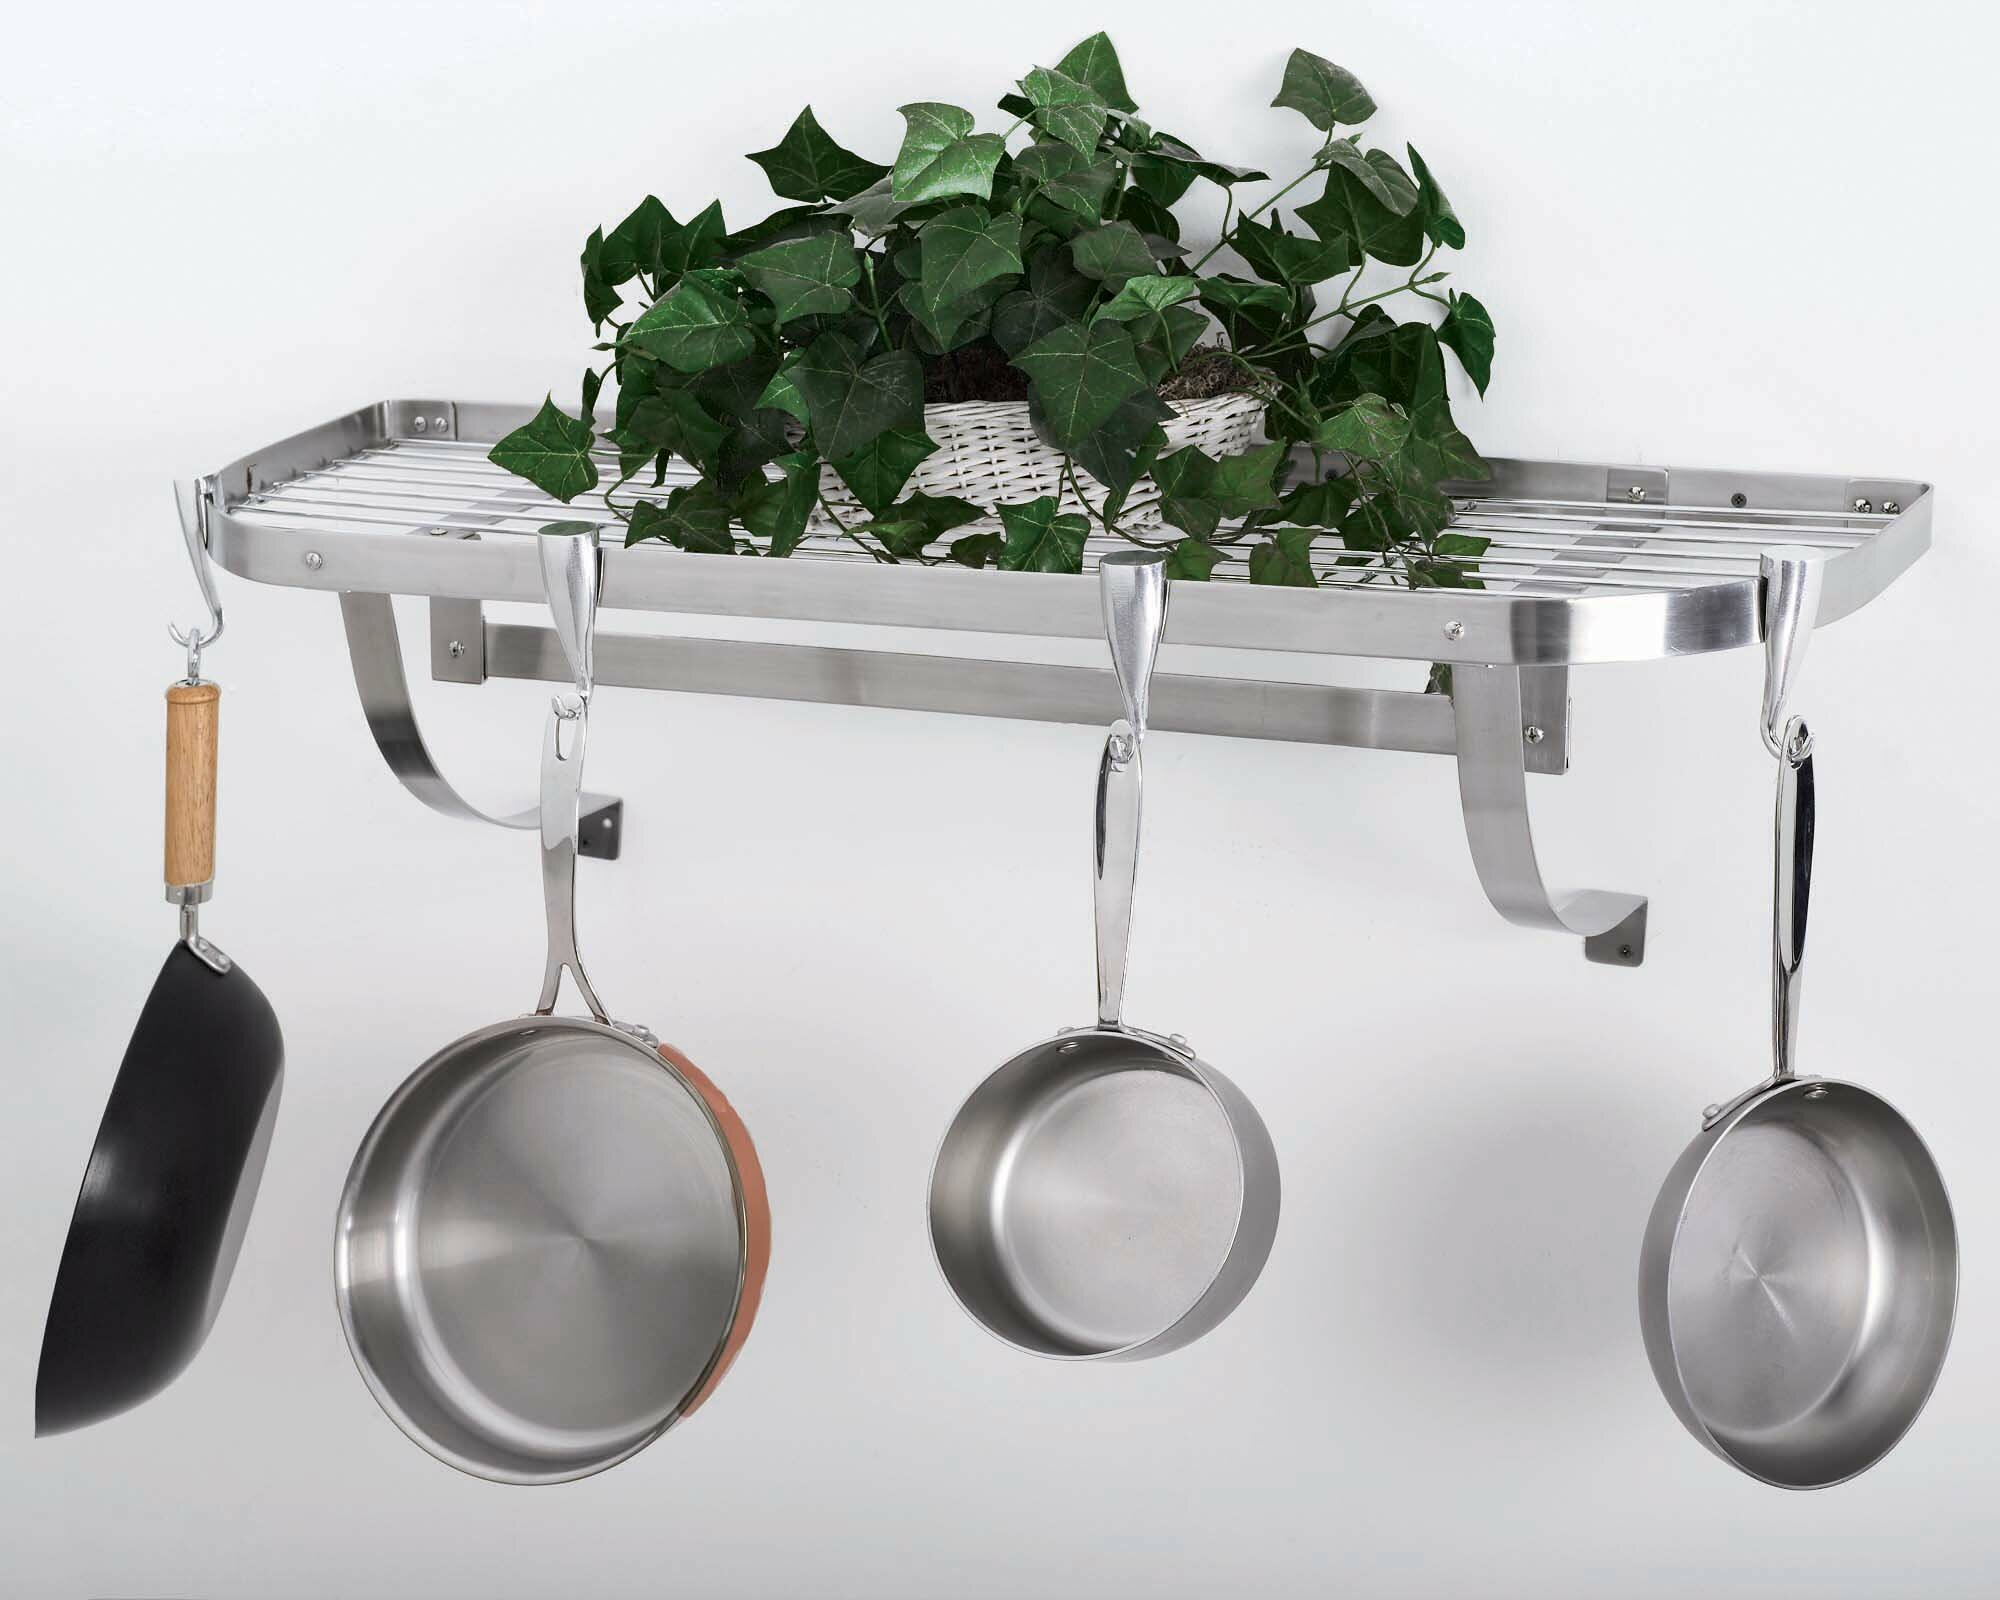 Concept Housewares Stainless Steel Wall Mounted Pot Rack Reviews Wayfair